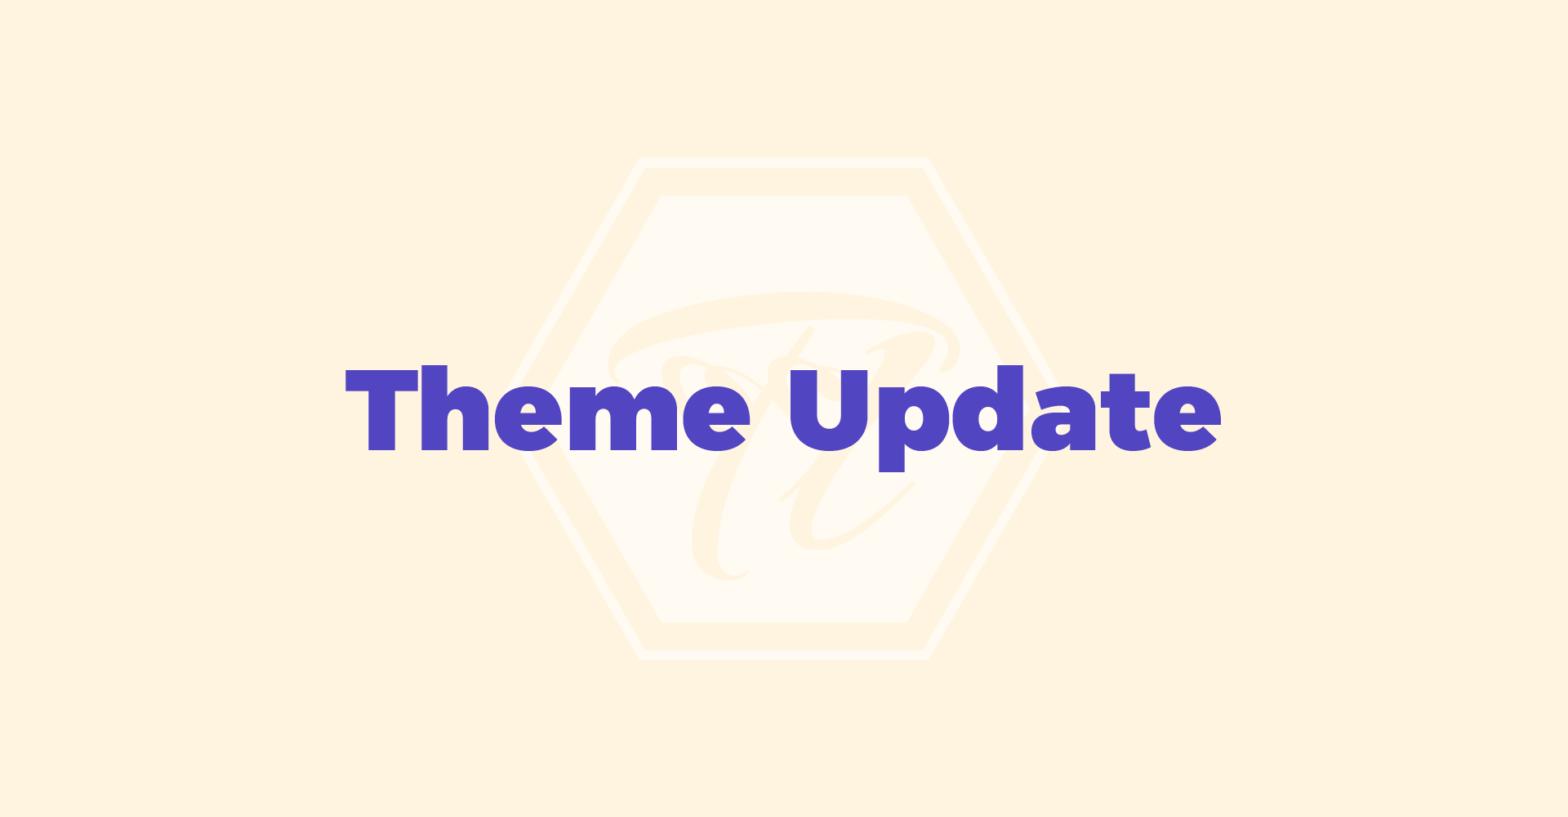 theme_update 4 1568x817